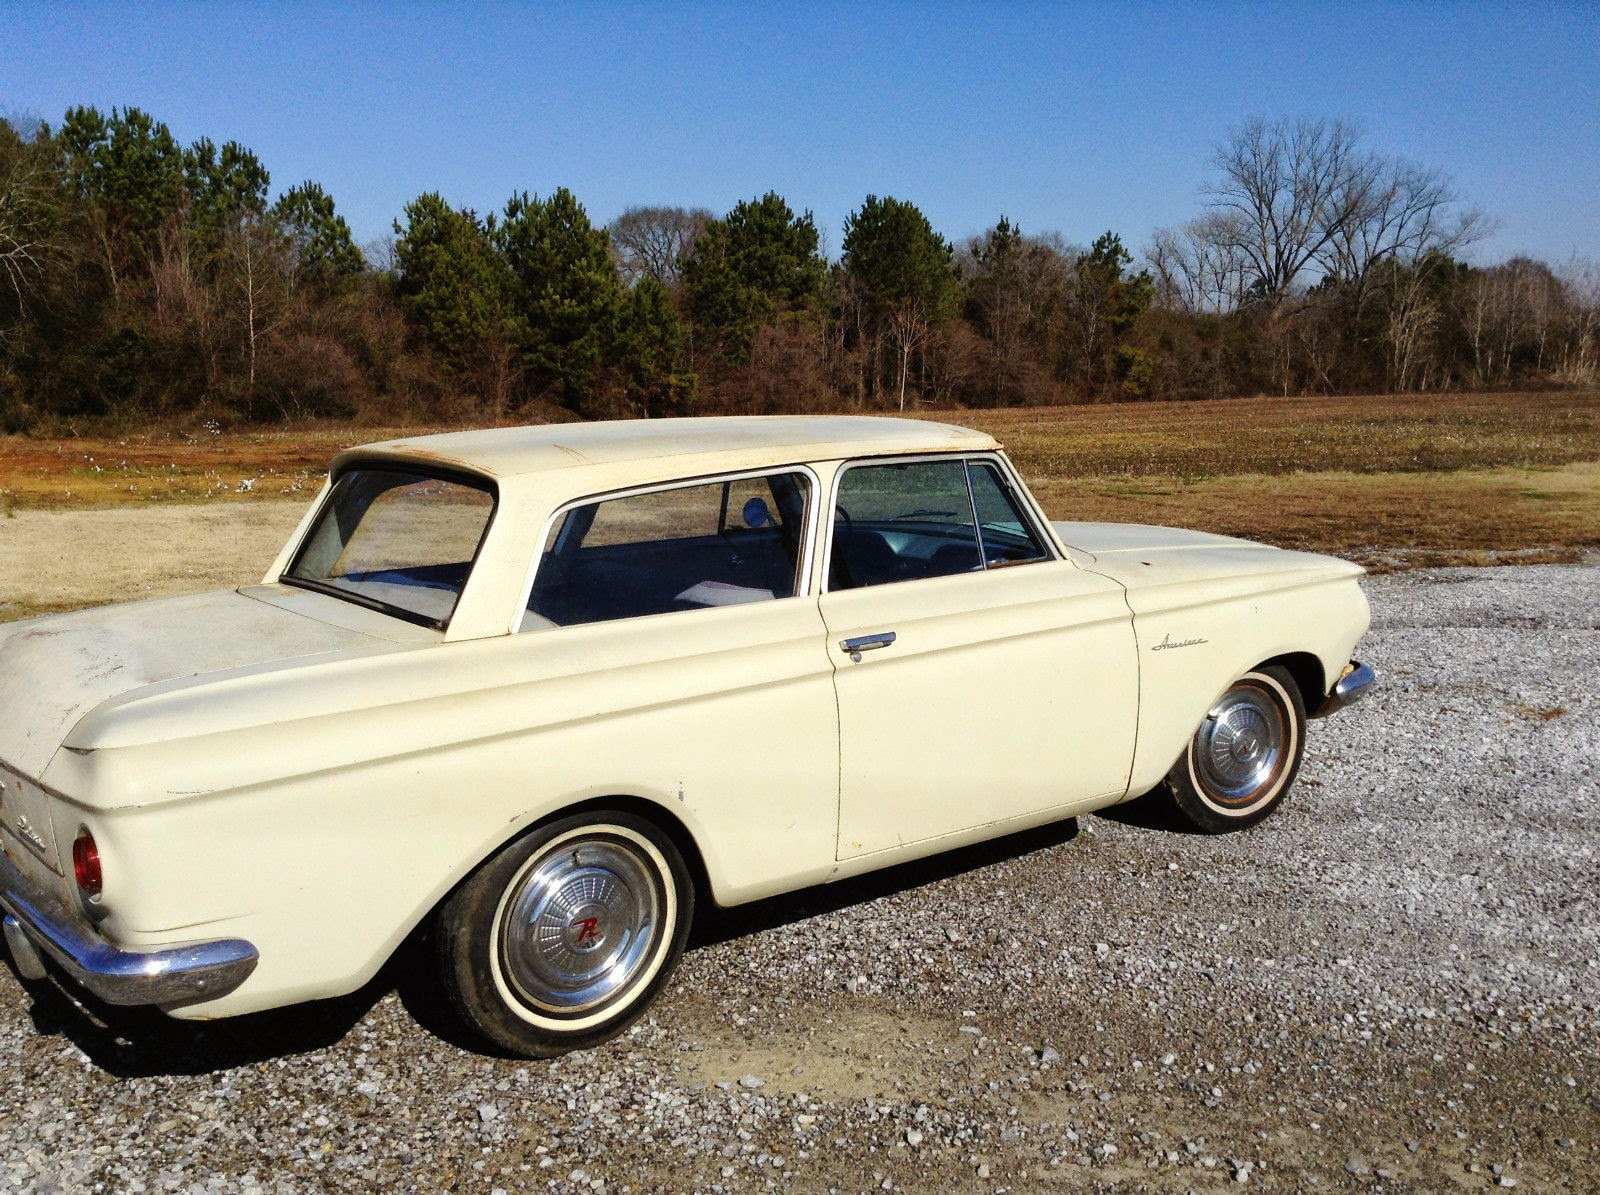 All American Classic Cars 1962 Rambler Deluxe 2 Door Sedan 1950 Motors Wiring Diagram